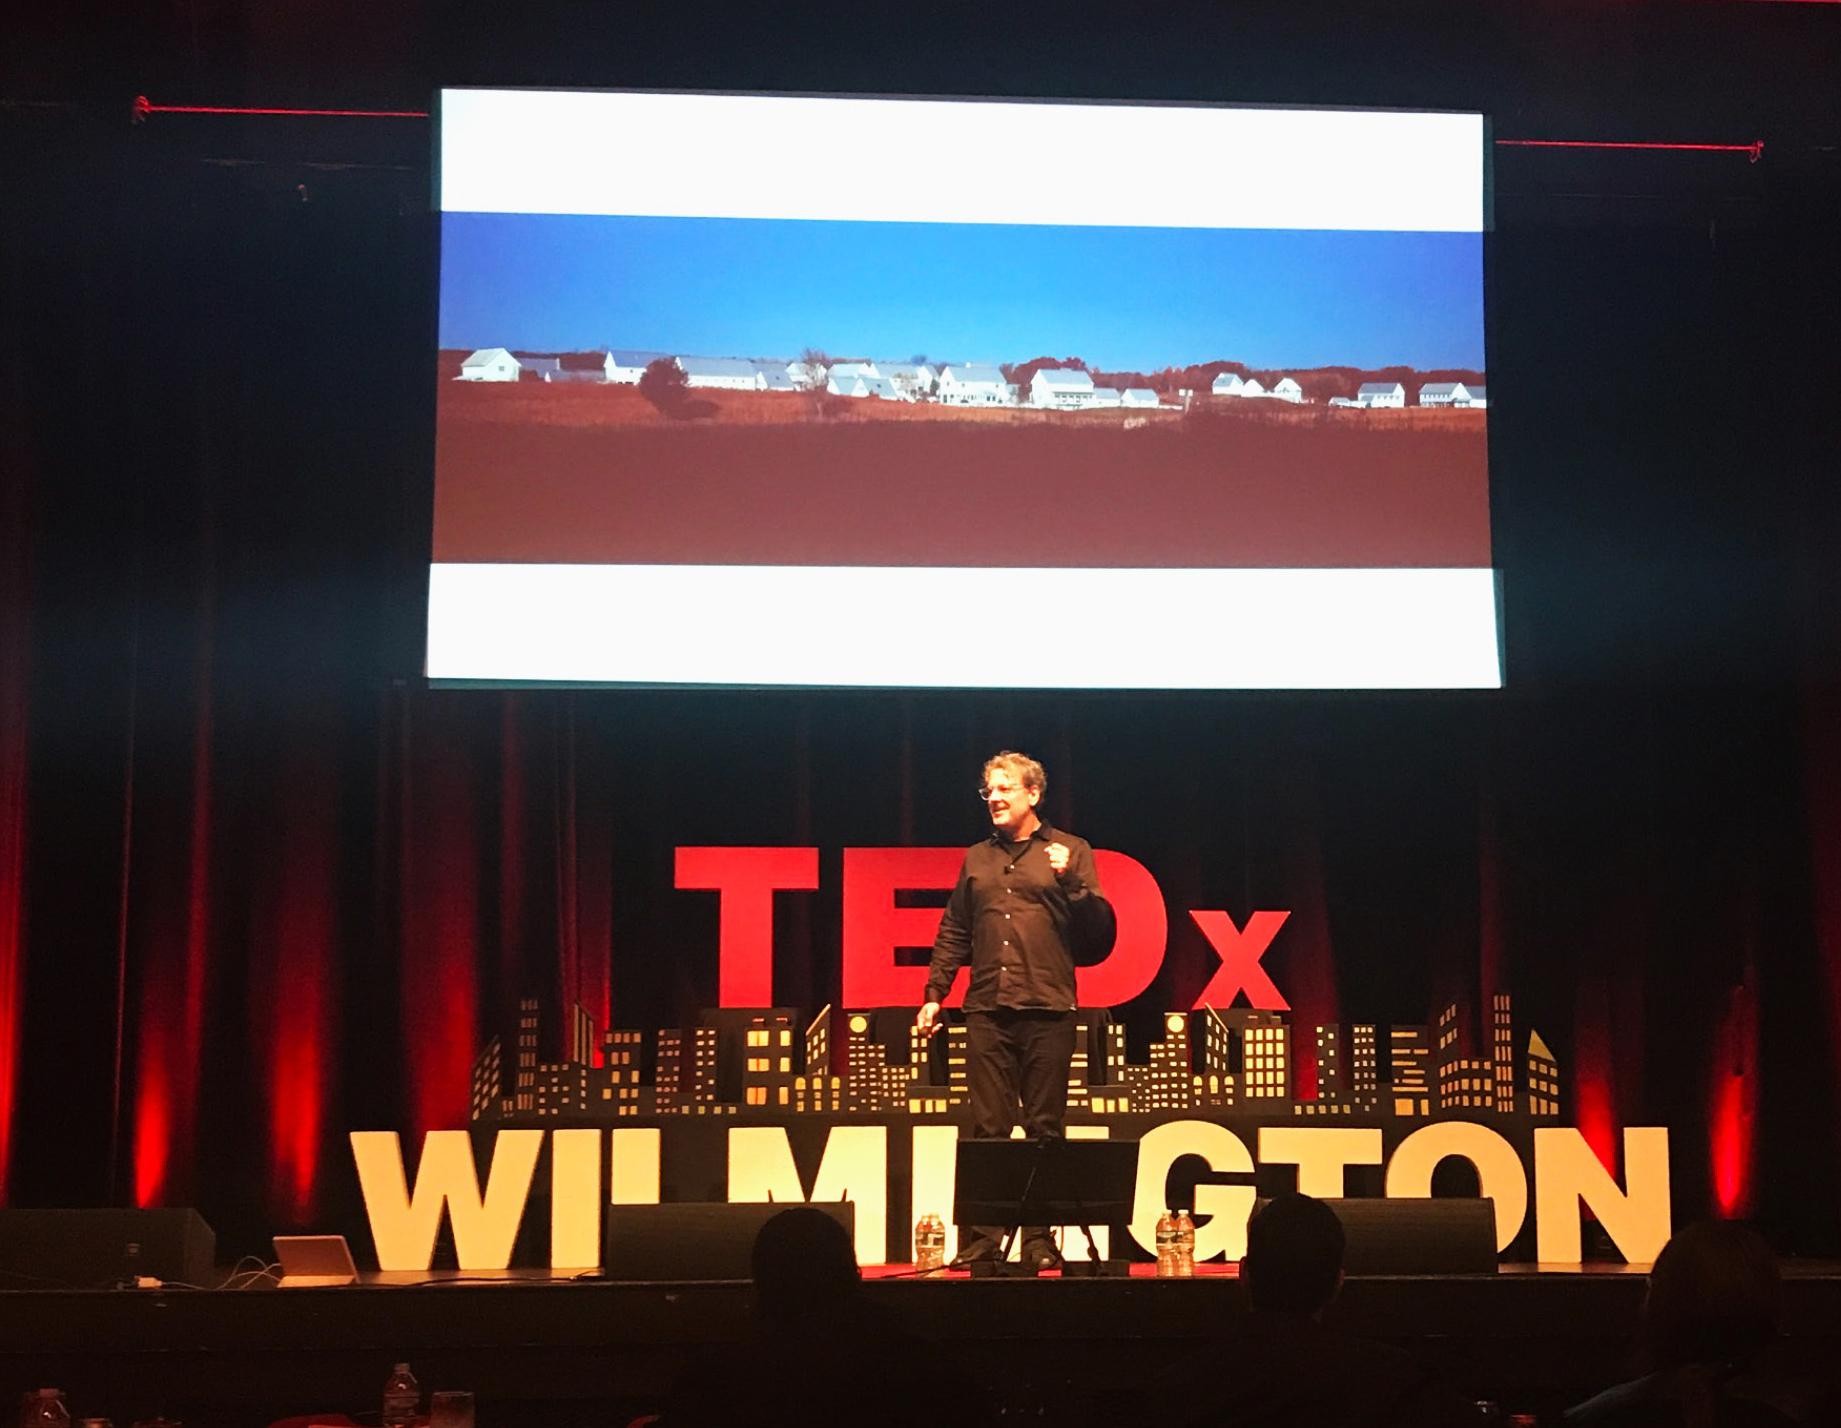 Shane Coen_TedX image 1.jpg